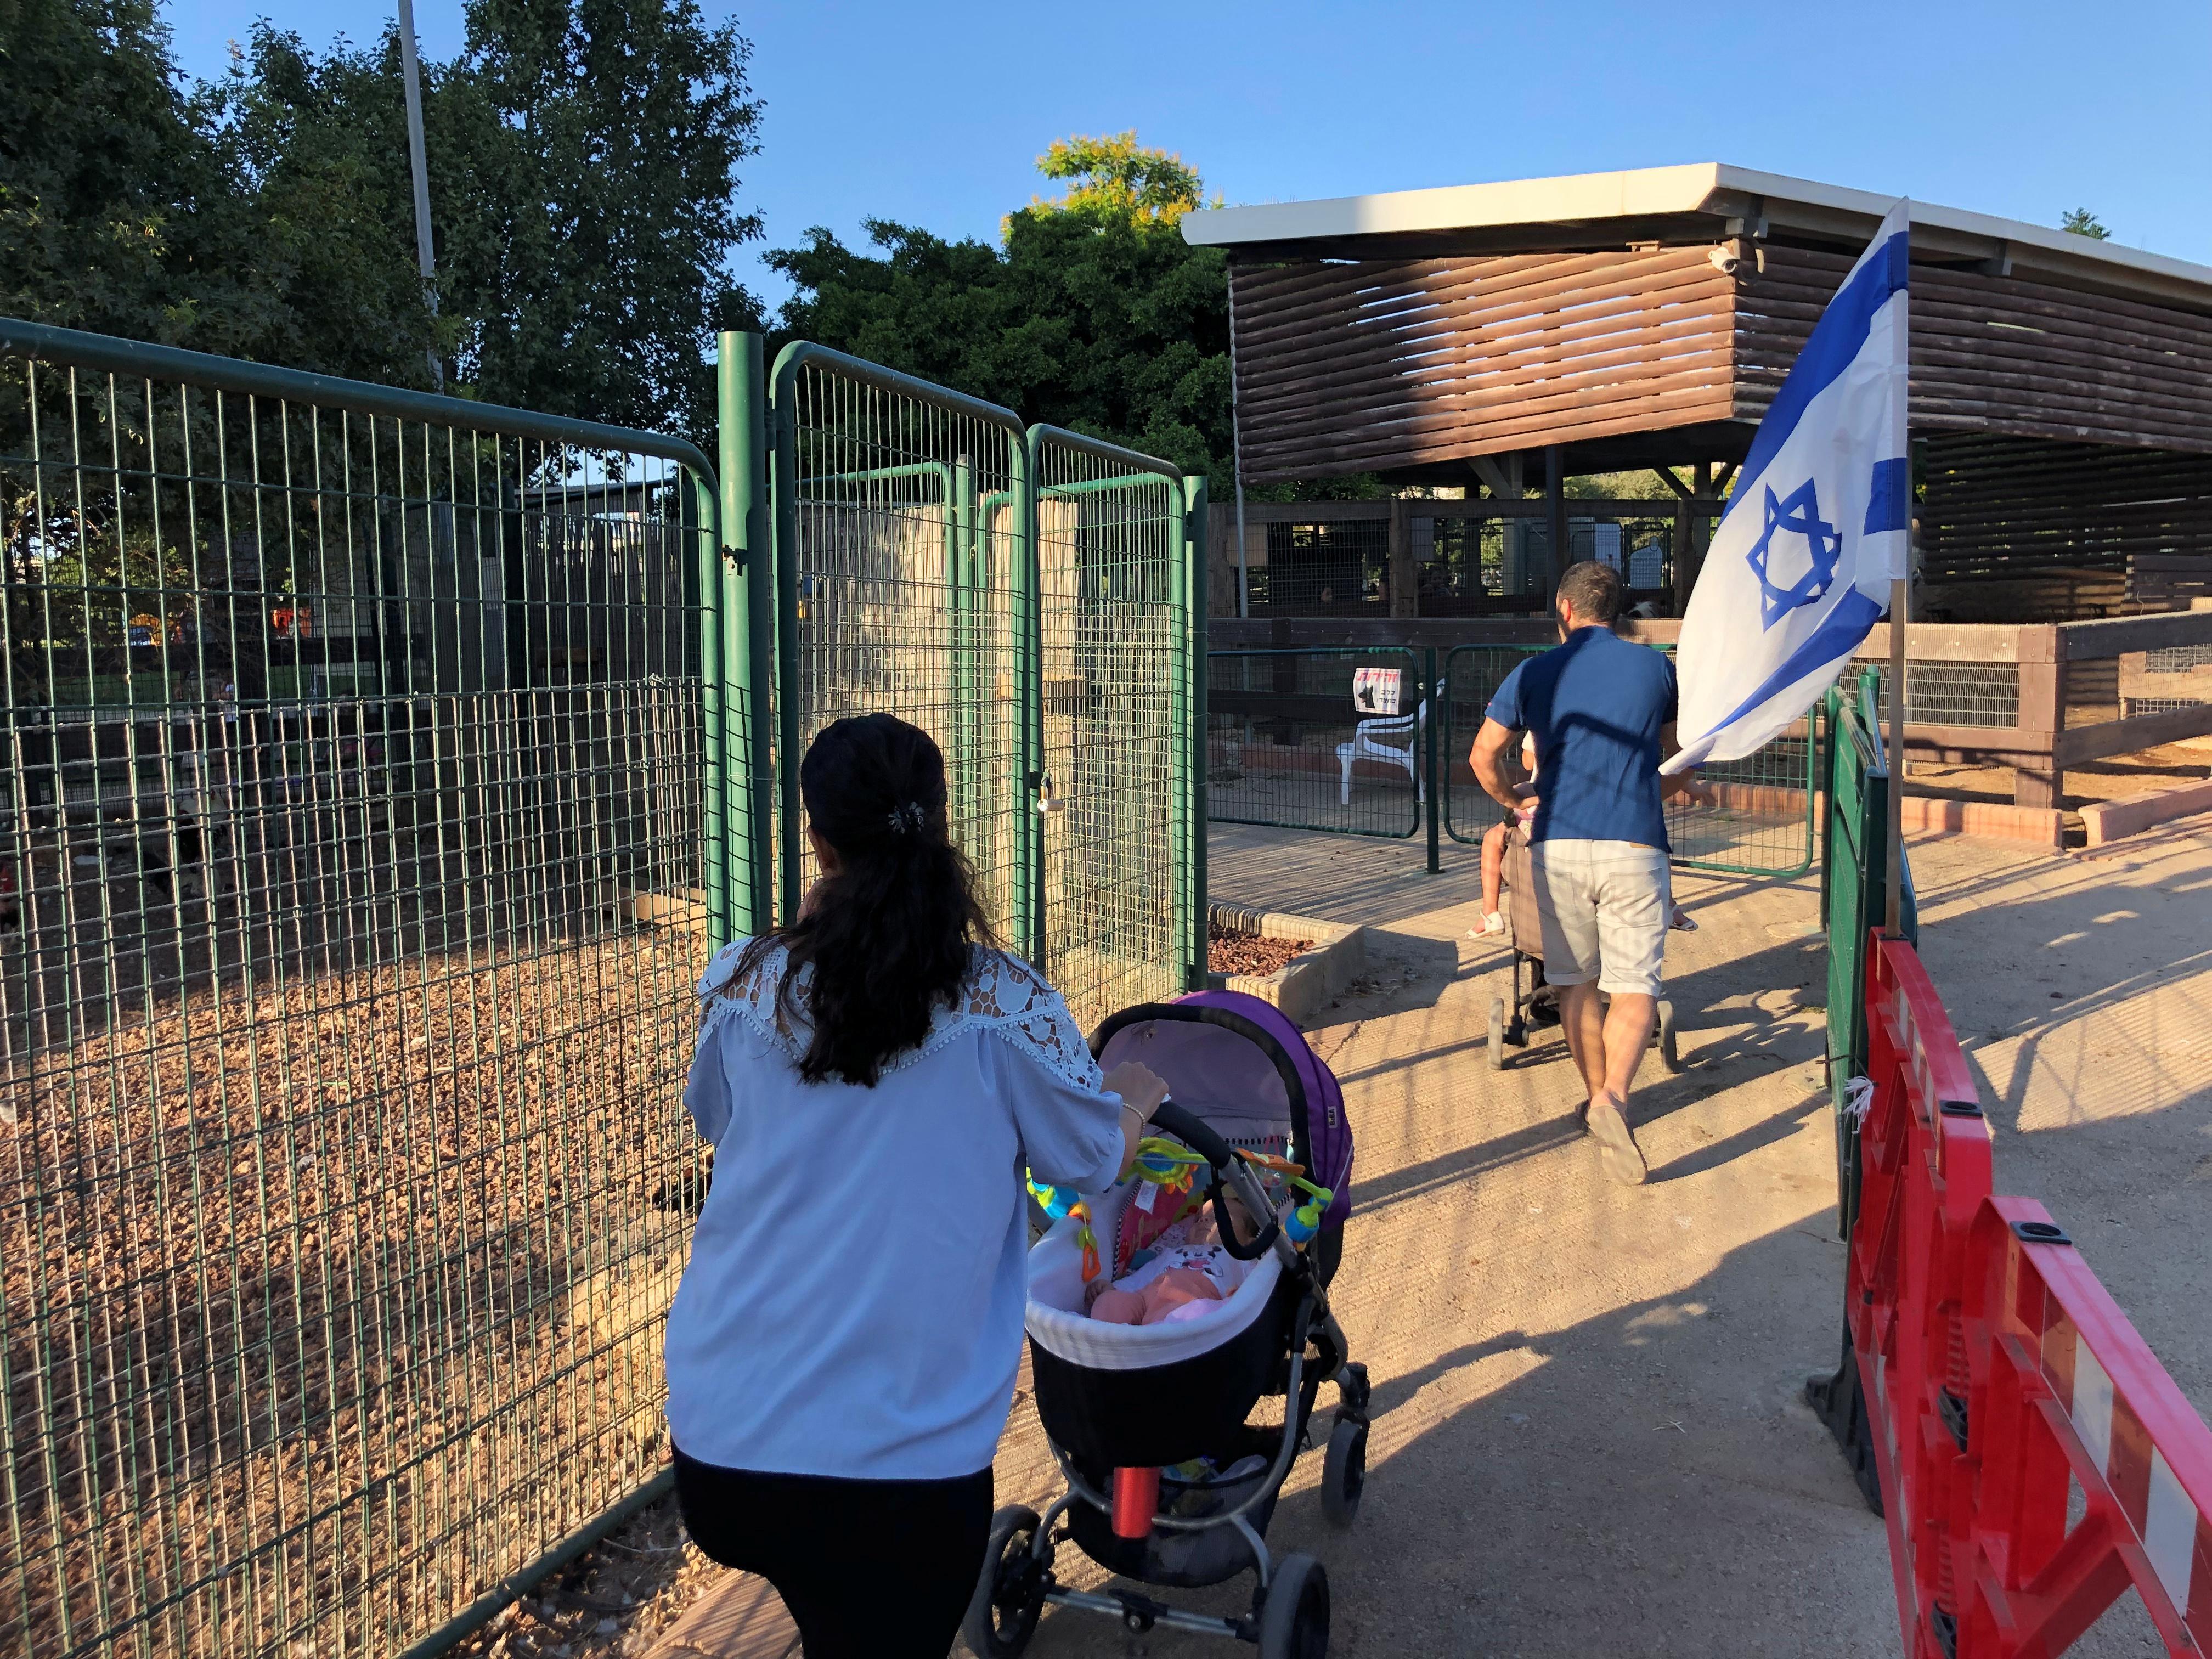 Israeli court halts park entry ban deemed racist by Arab citizens